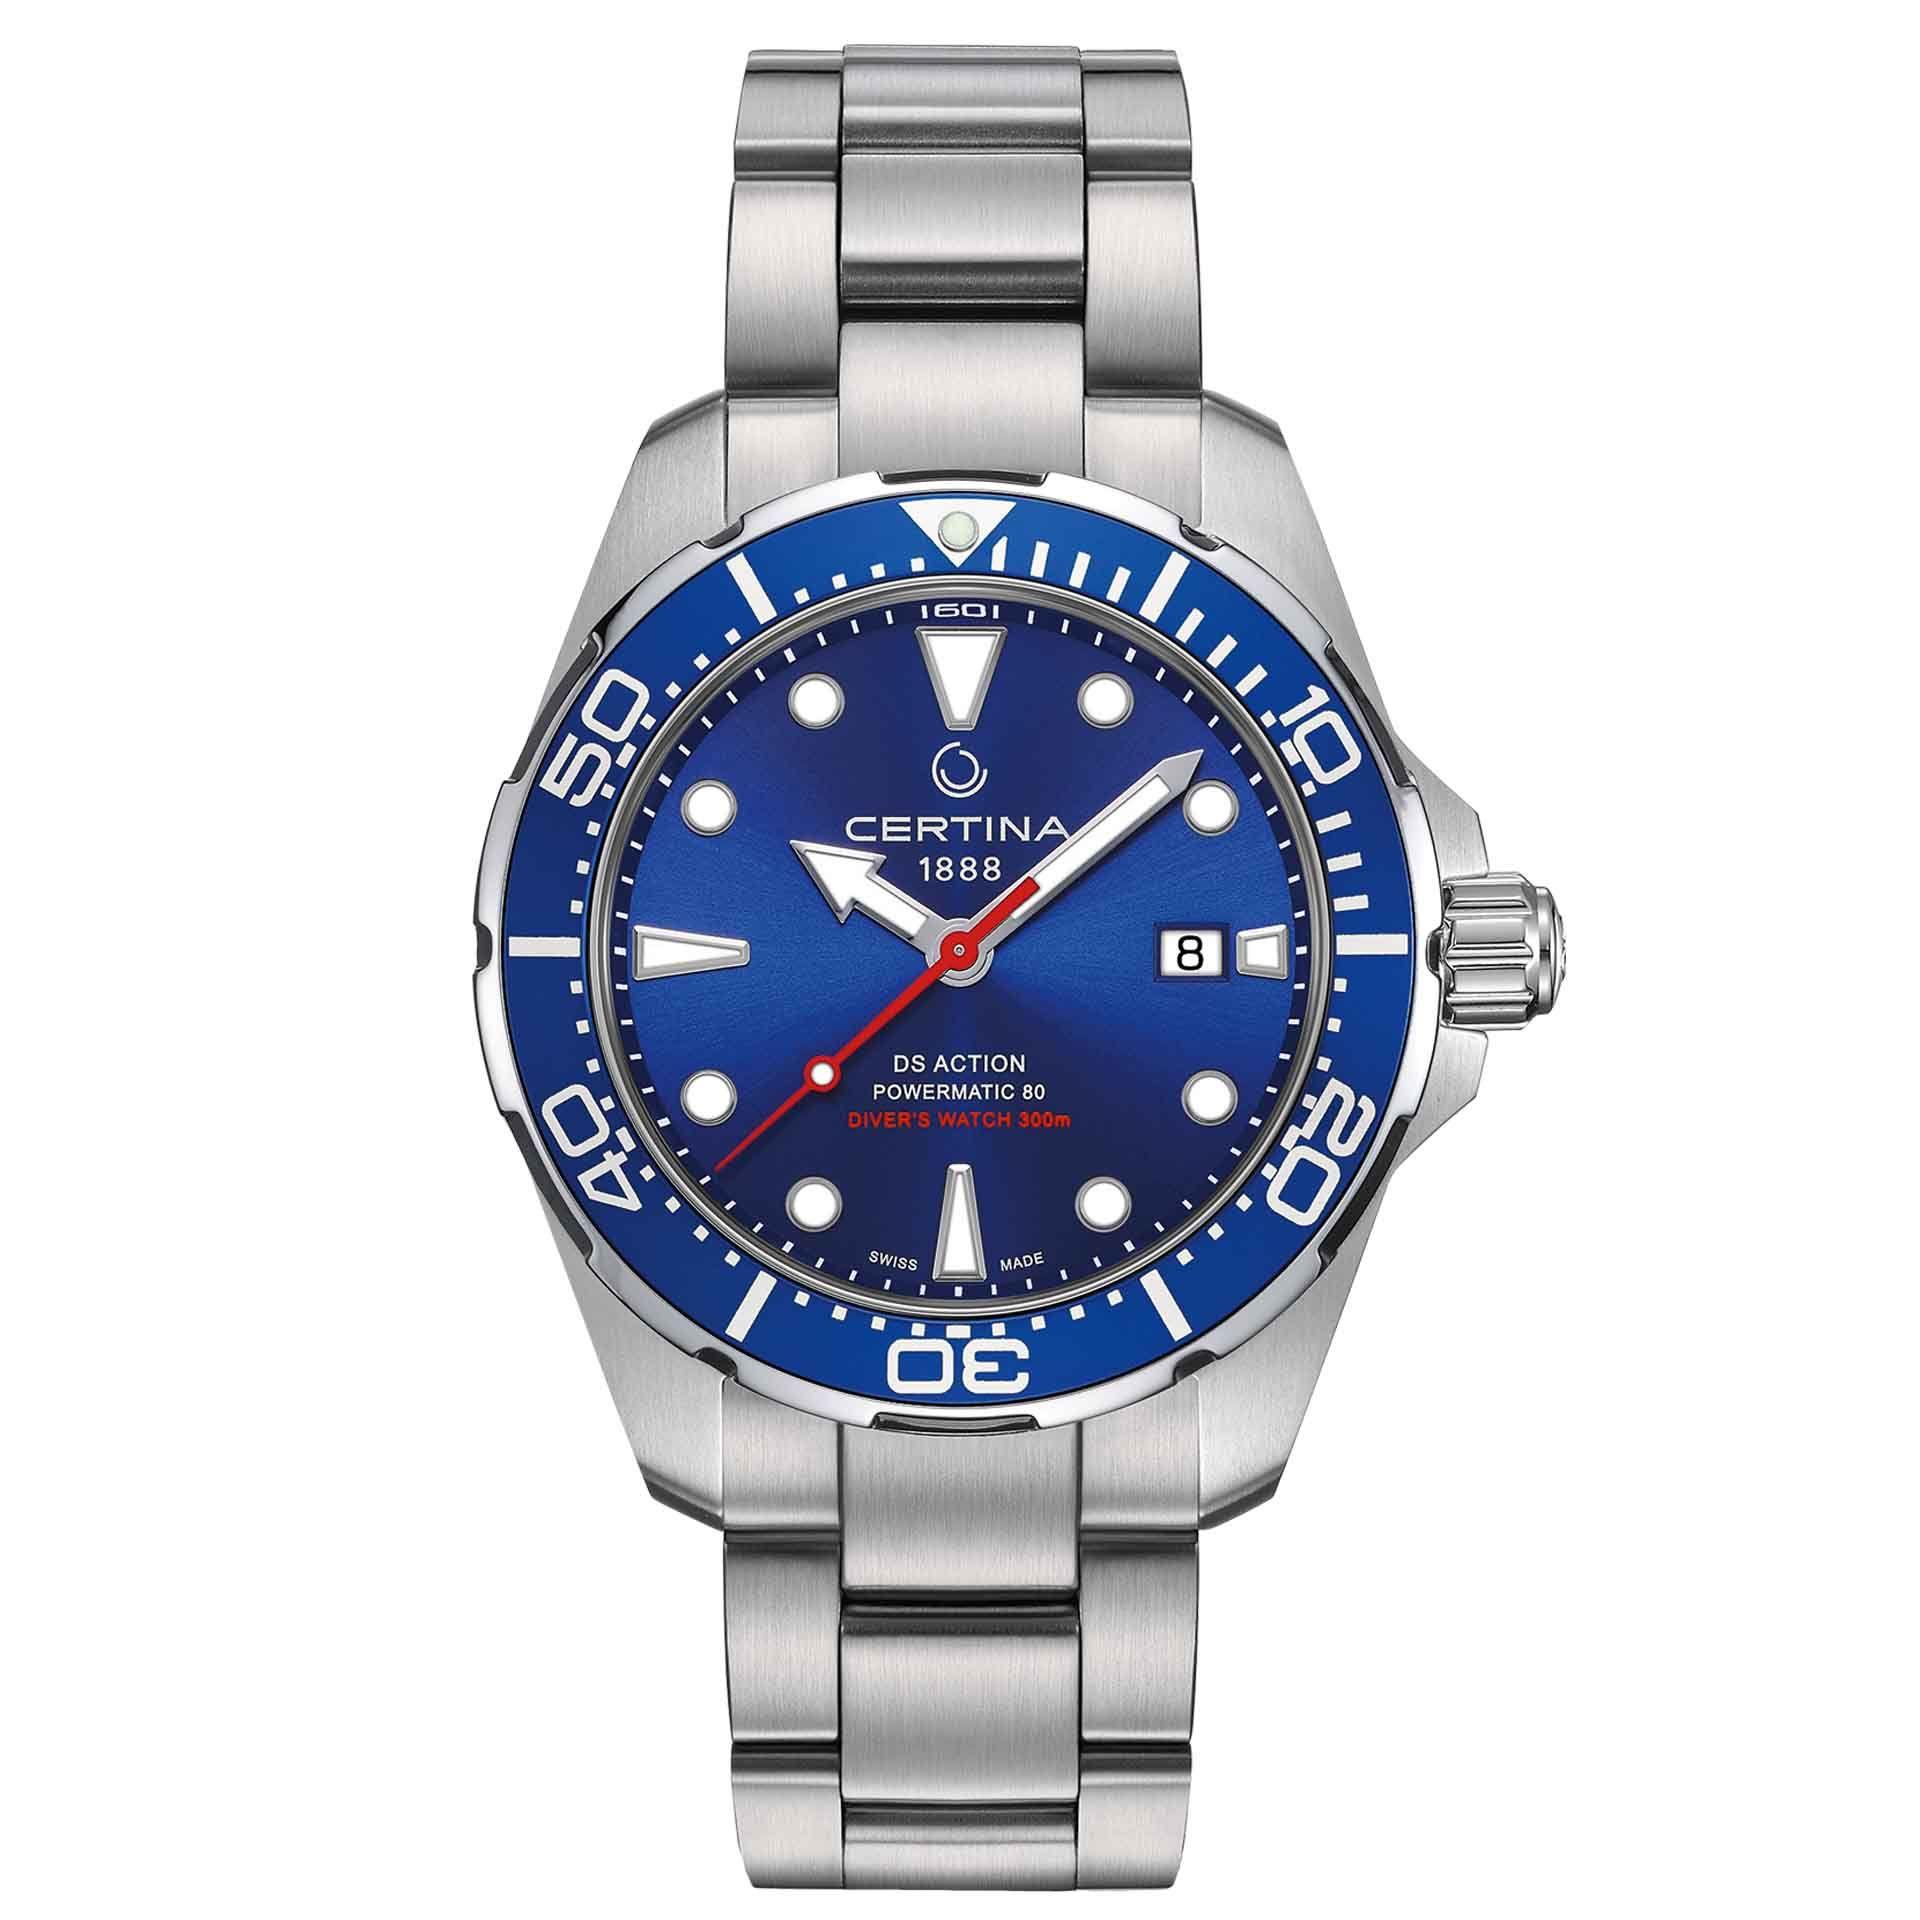 Certina Ds Action Diver Automatic Herenhorloge Horloges Horloge